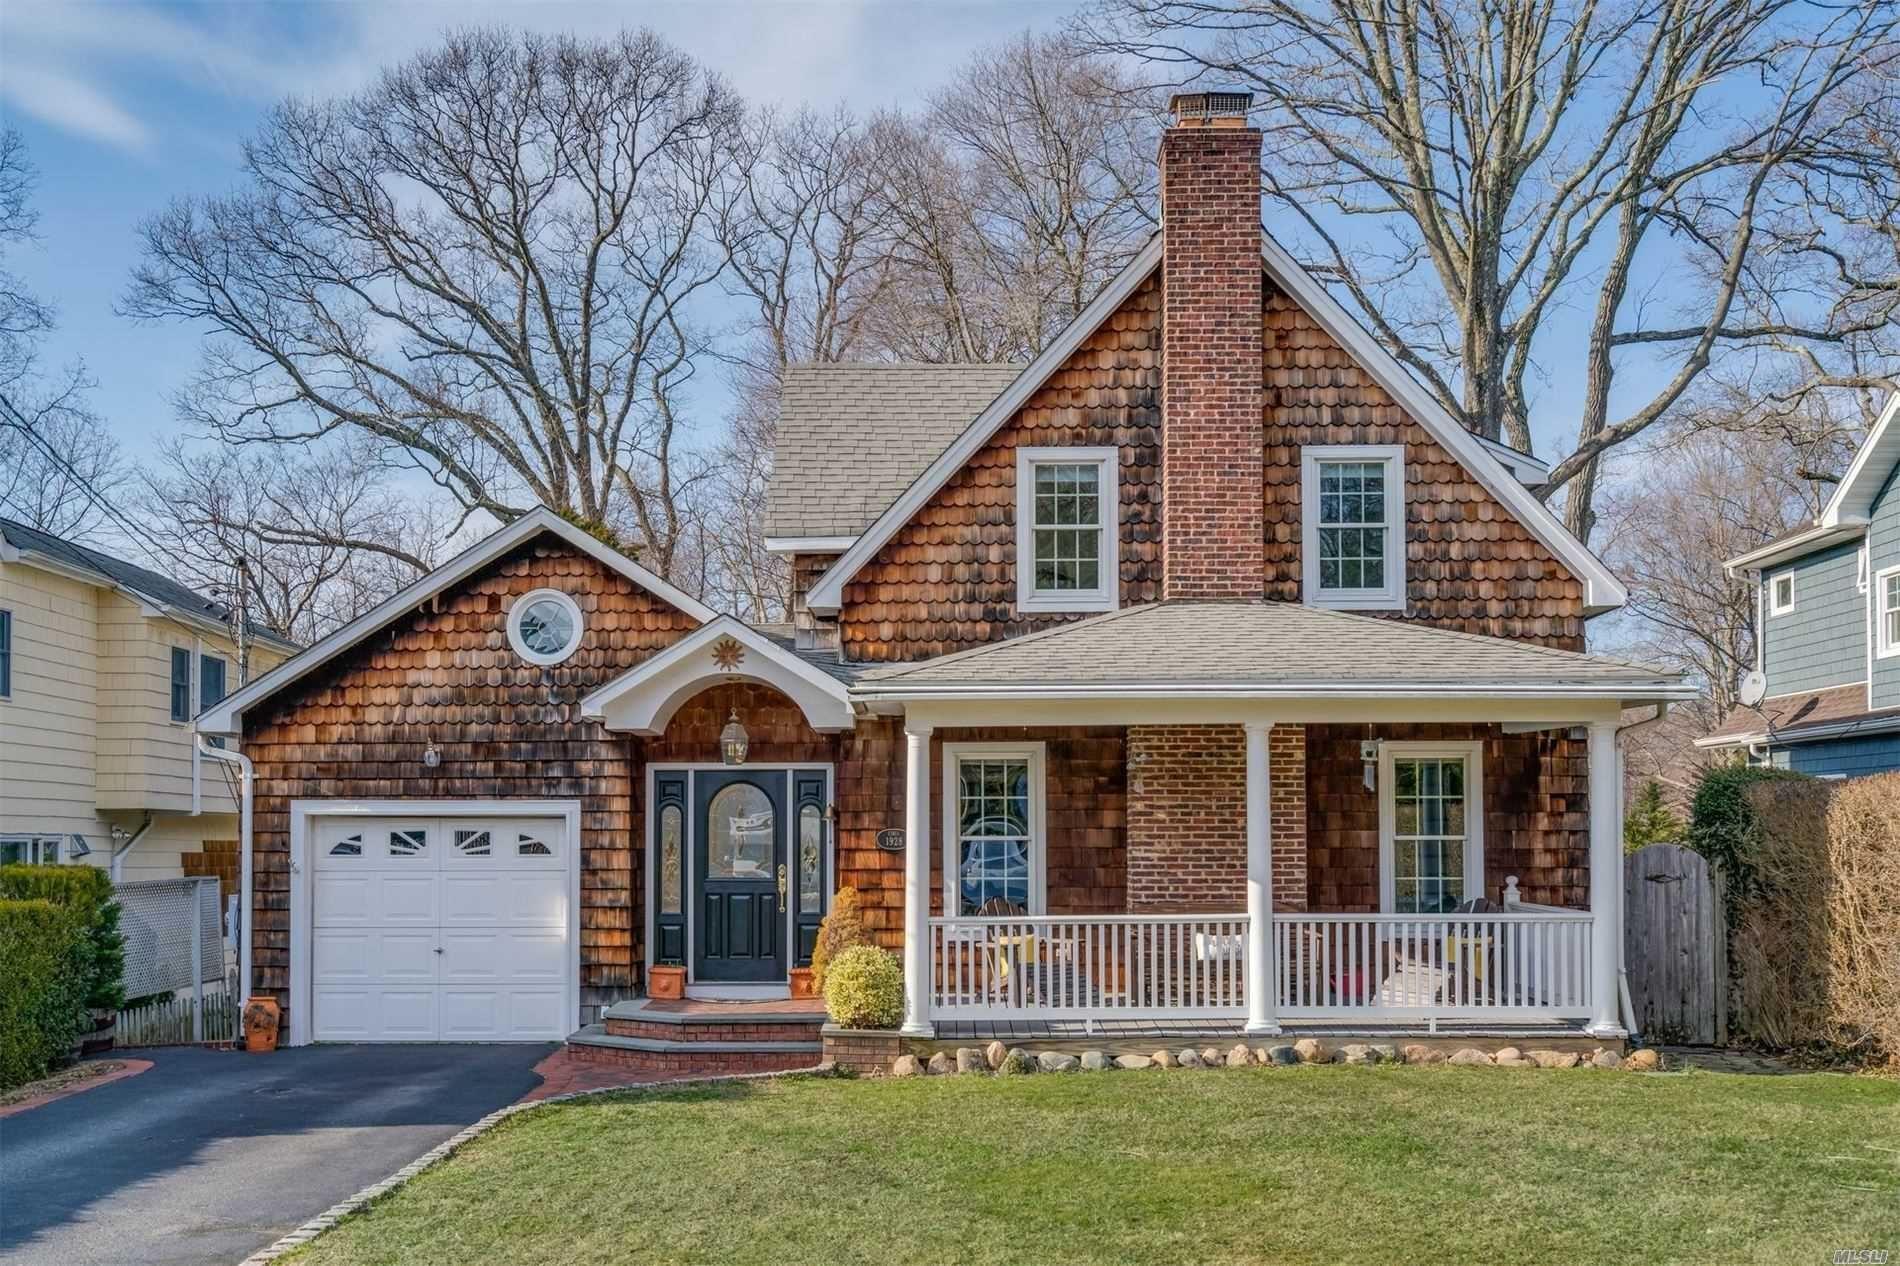 39 Grove Street, Cold Spring Harbor, NY 11724 - MLS#: 3207300